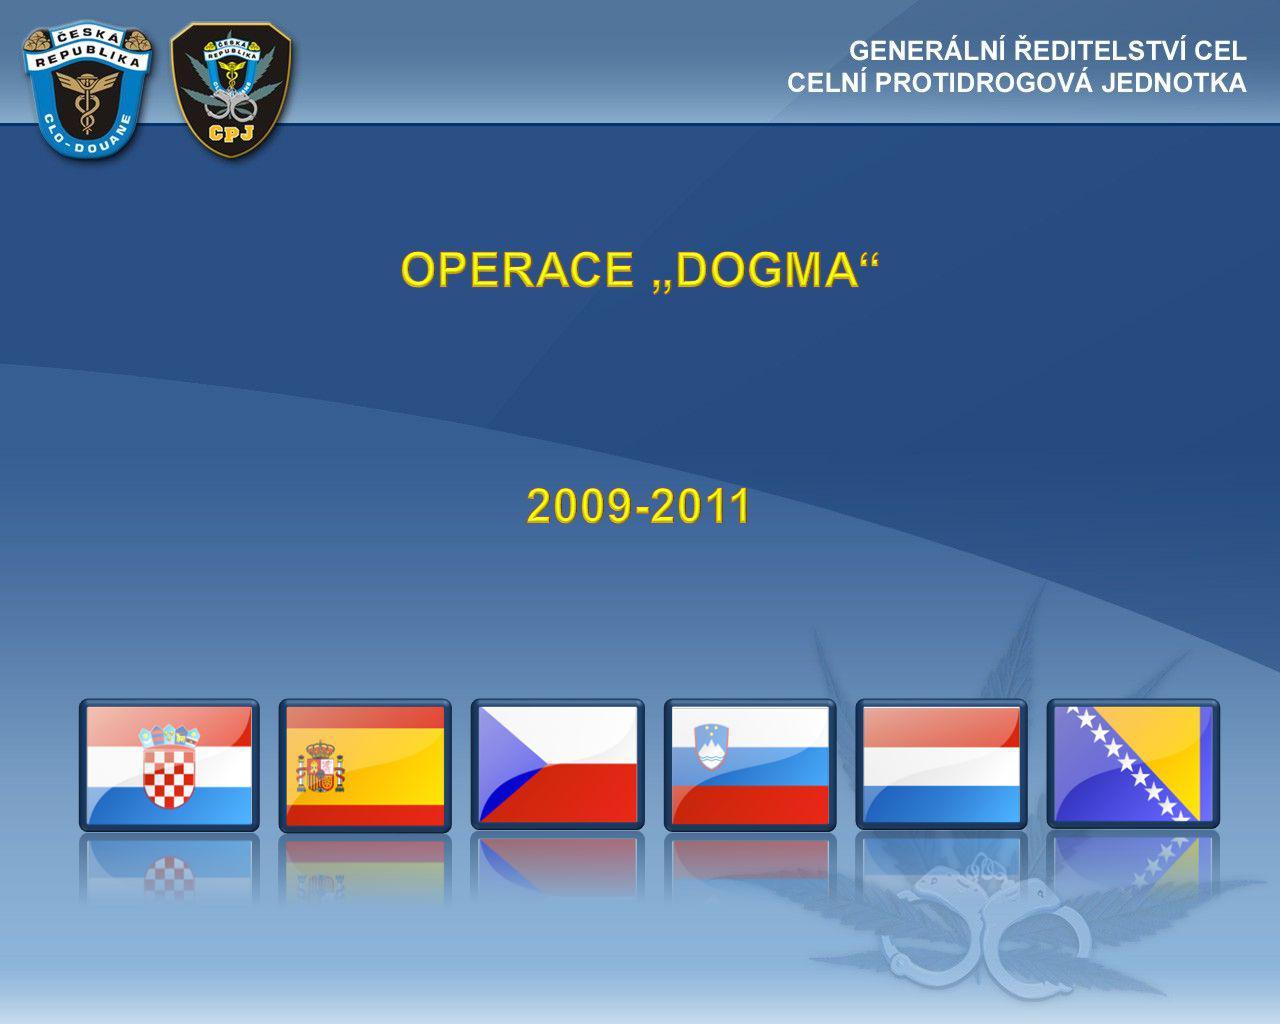 "OPERACE ""DOGMA 2009-2011"